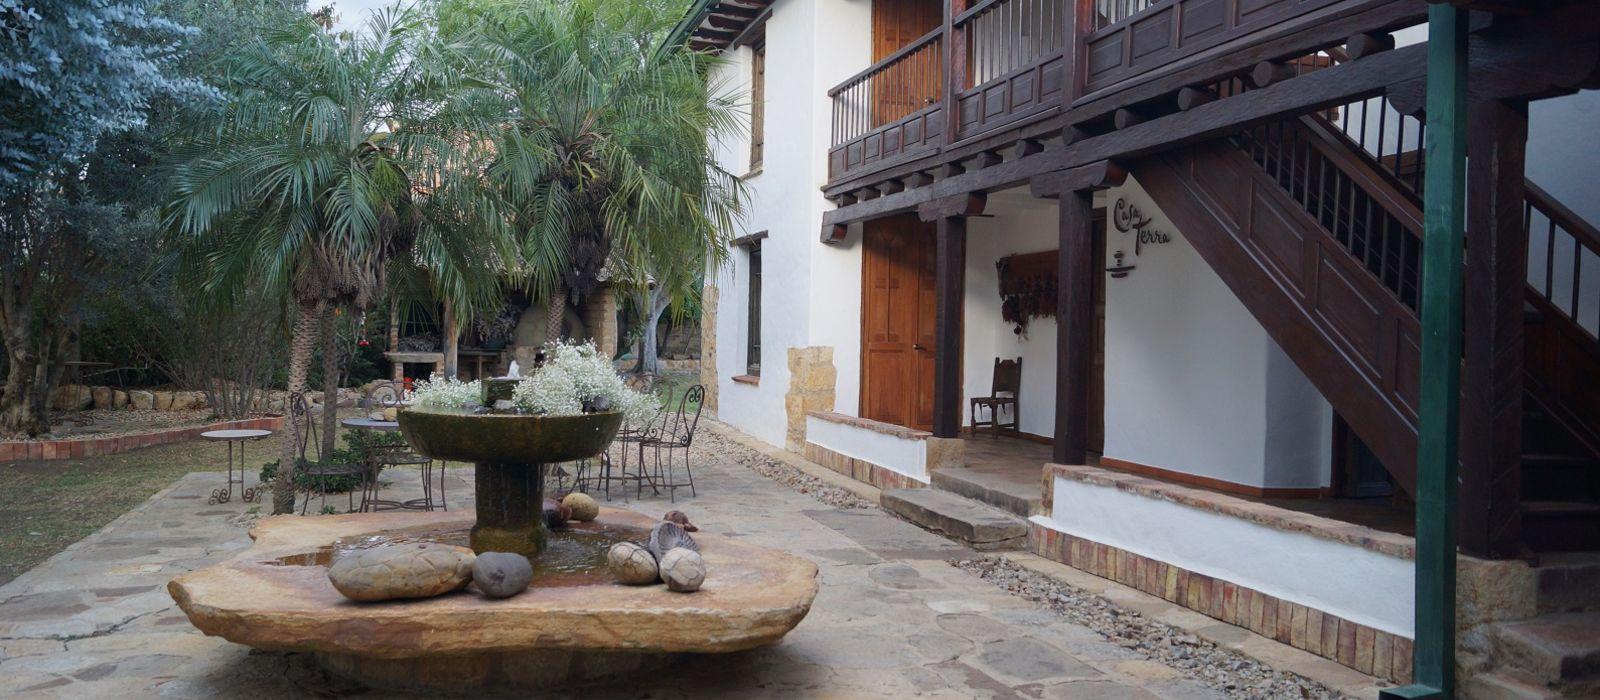 Hotel Casa Terra Kolumbien